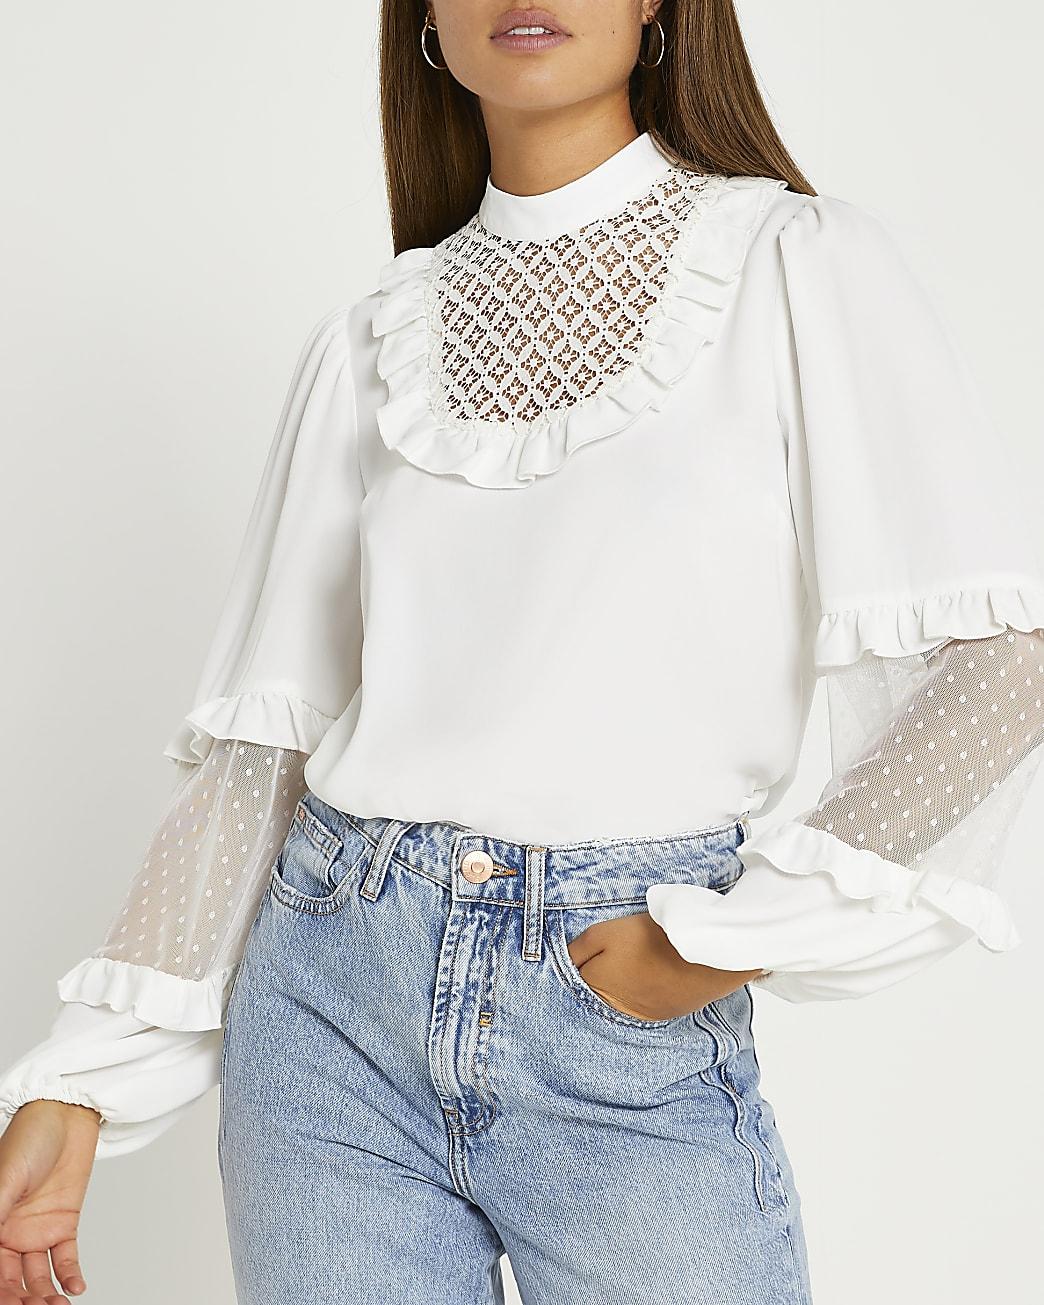 White long sleeve top